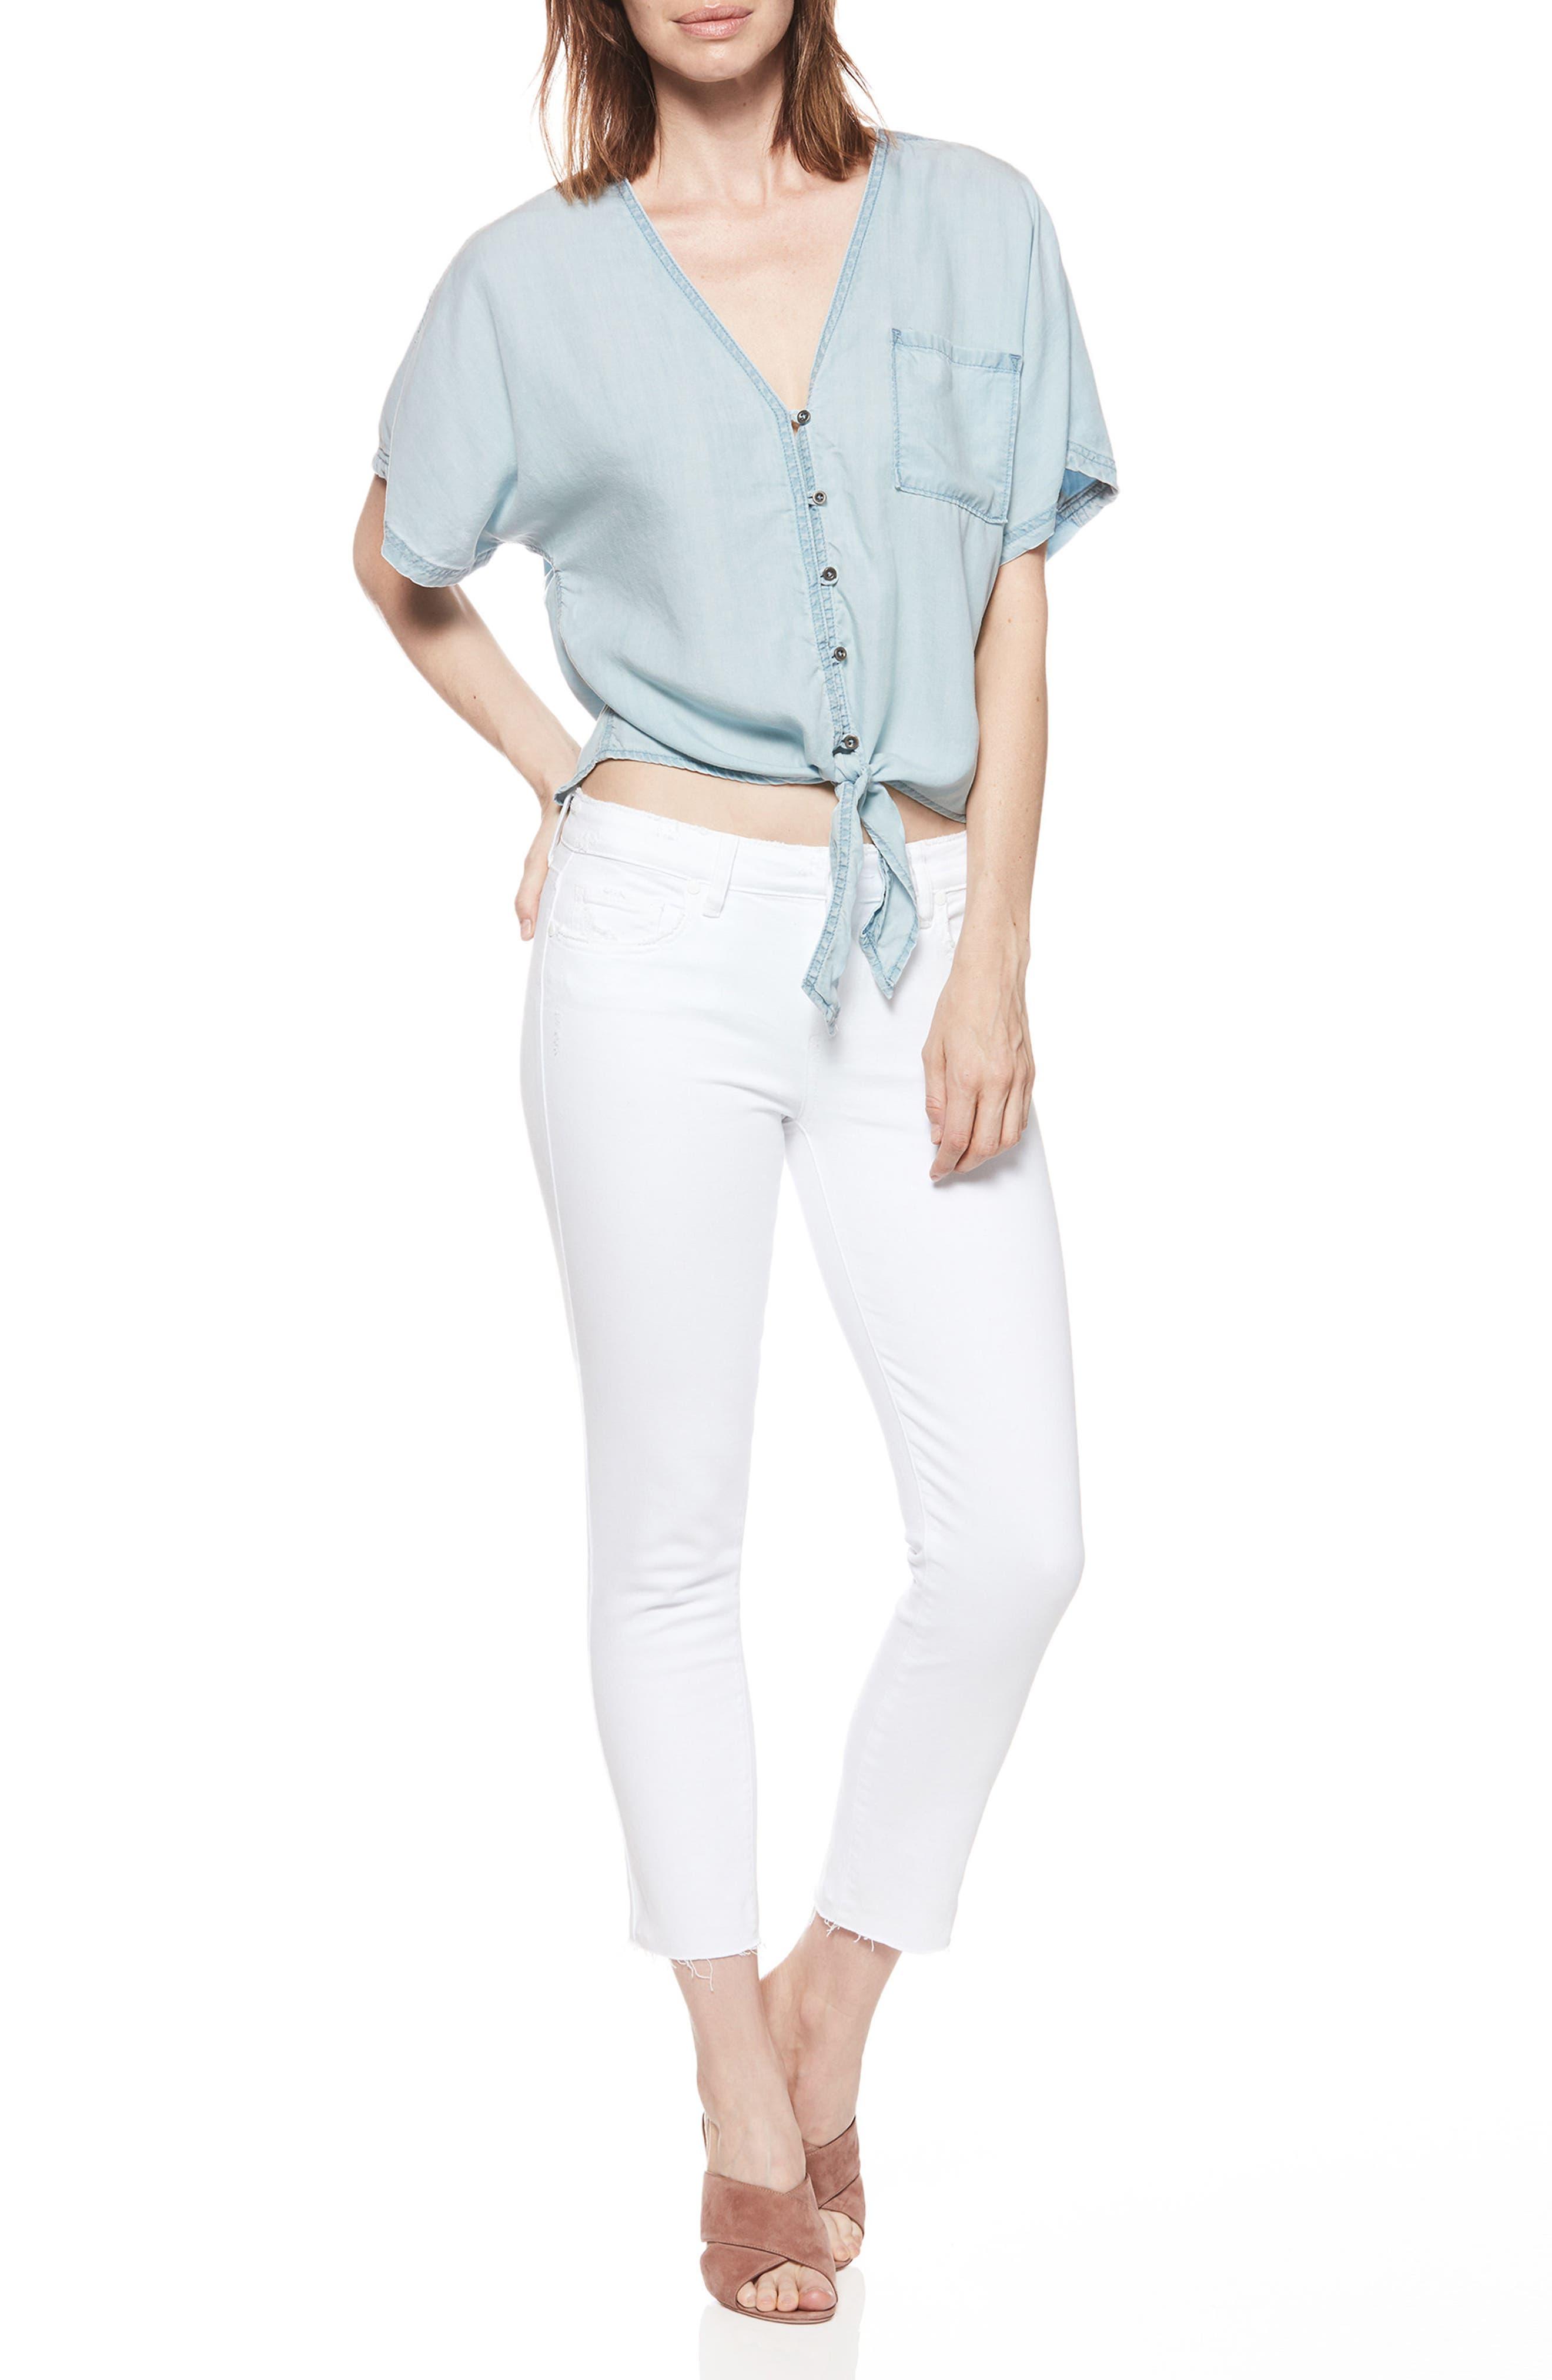 PAIGE, Skyline Raw Hem Crop Skinny Jeans, Alternate thumbnail 8, color, LIVED IN CRISP WHITE